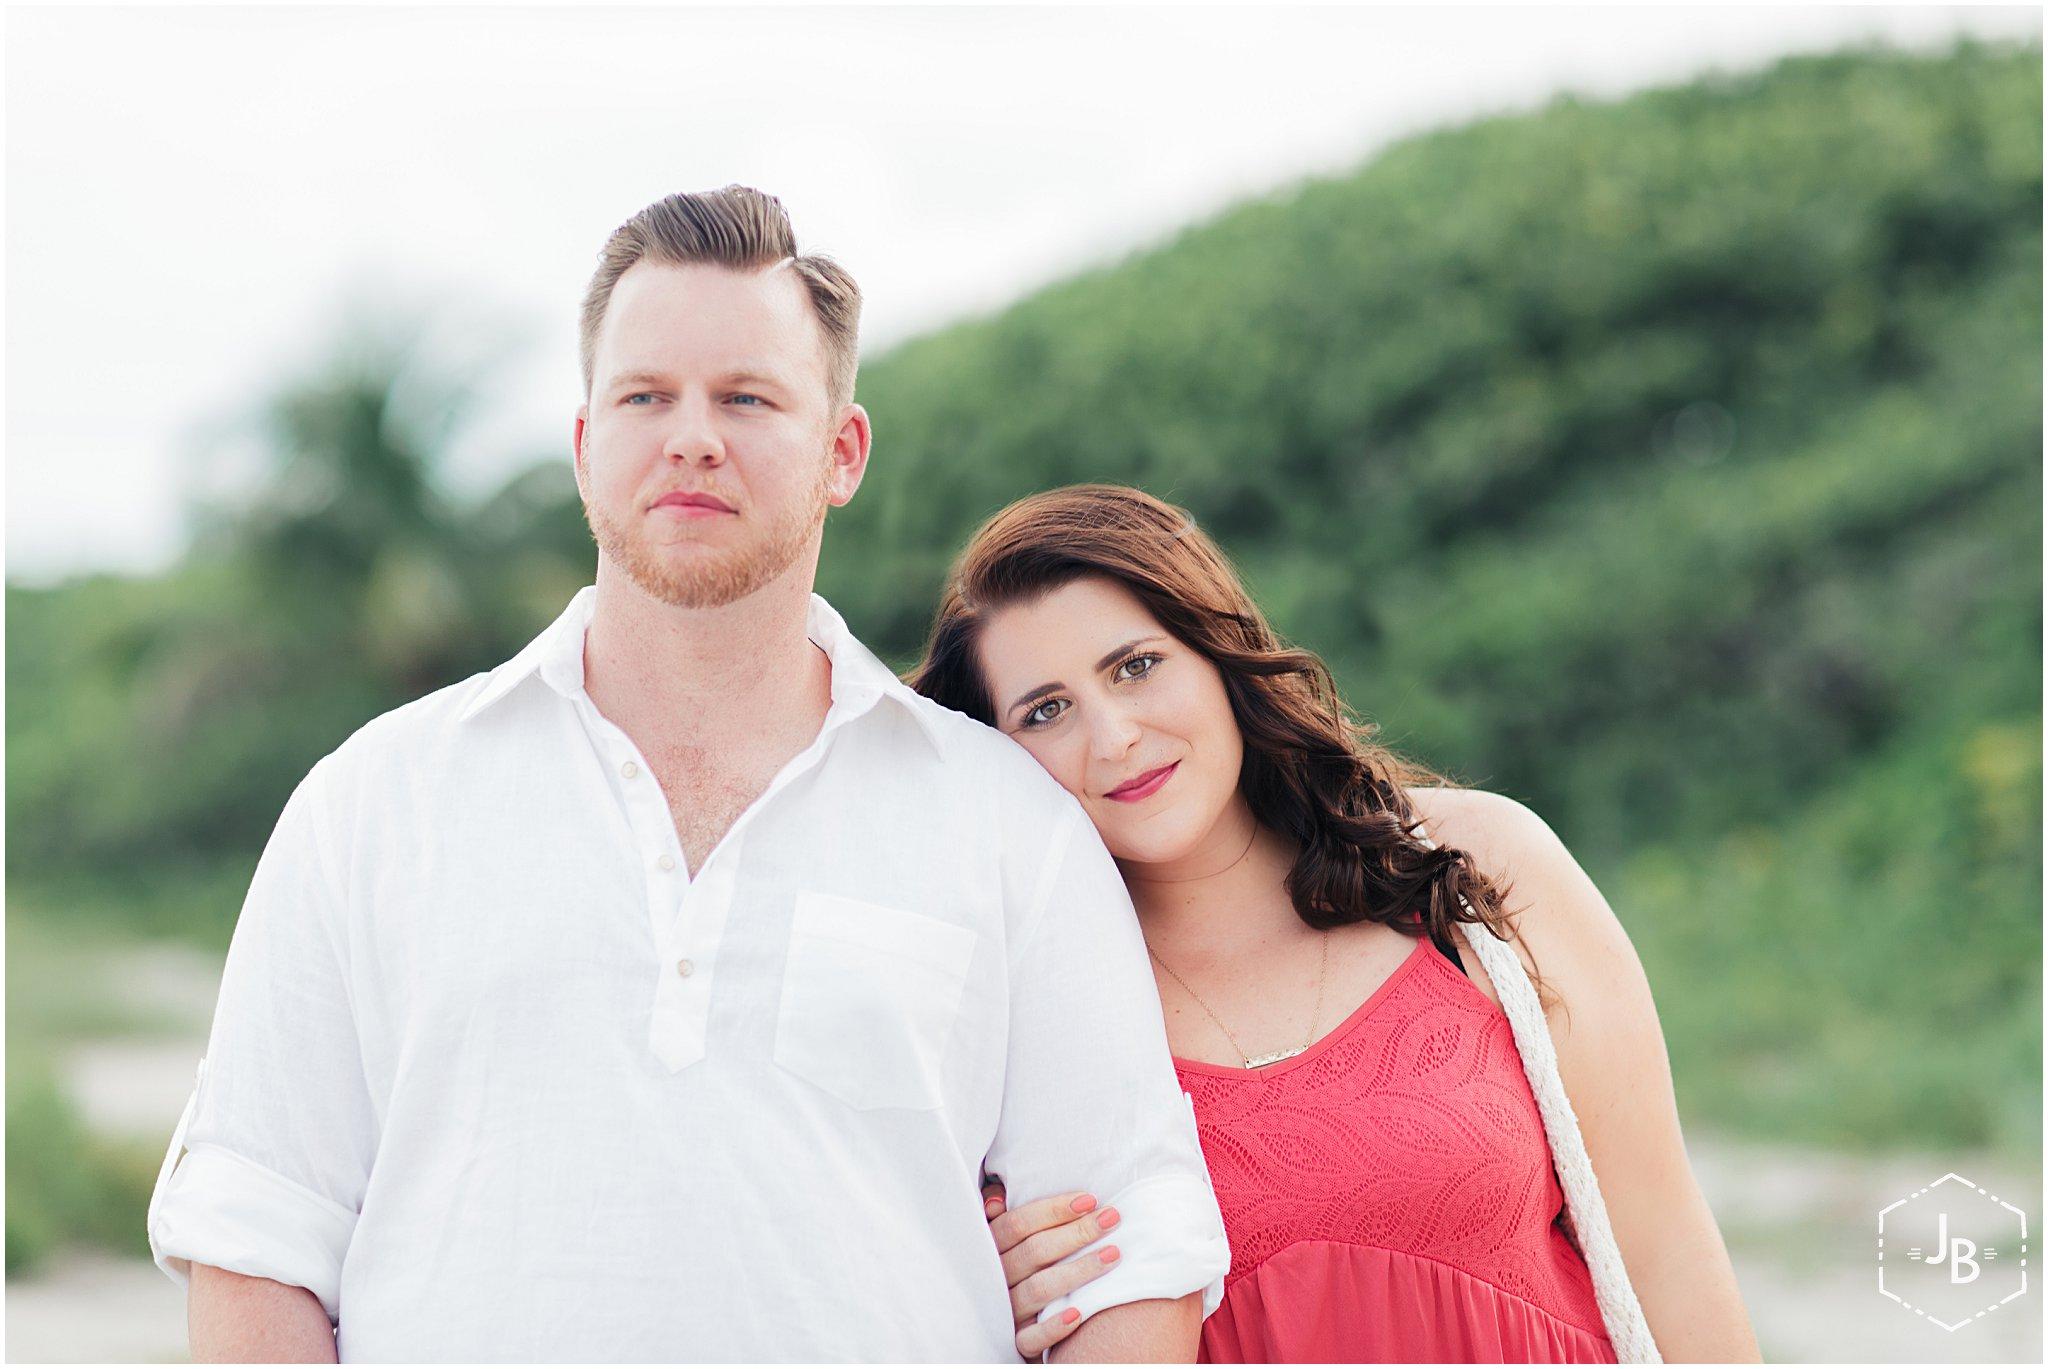 WeddingandEngagementFloridaPhotographer_0003.jpg